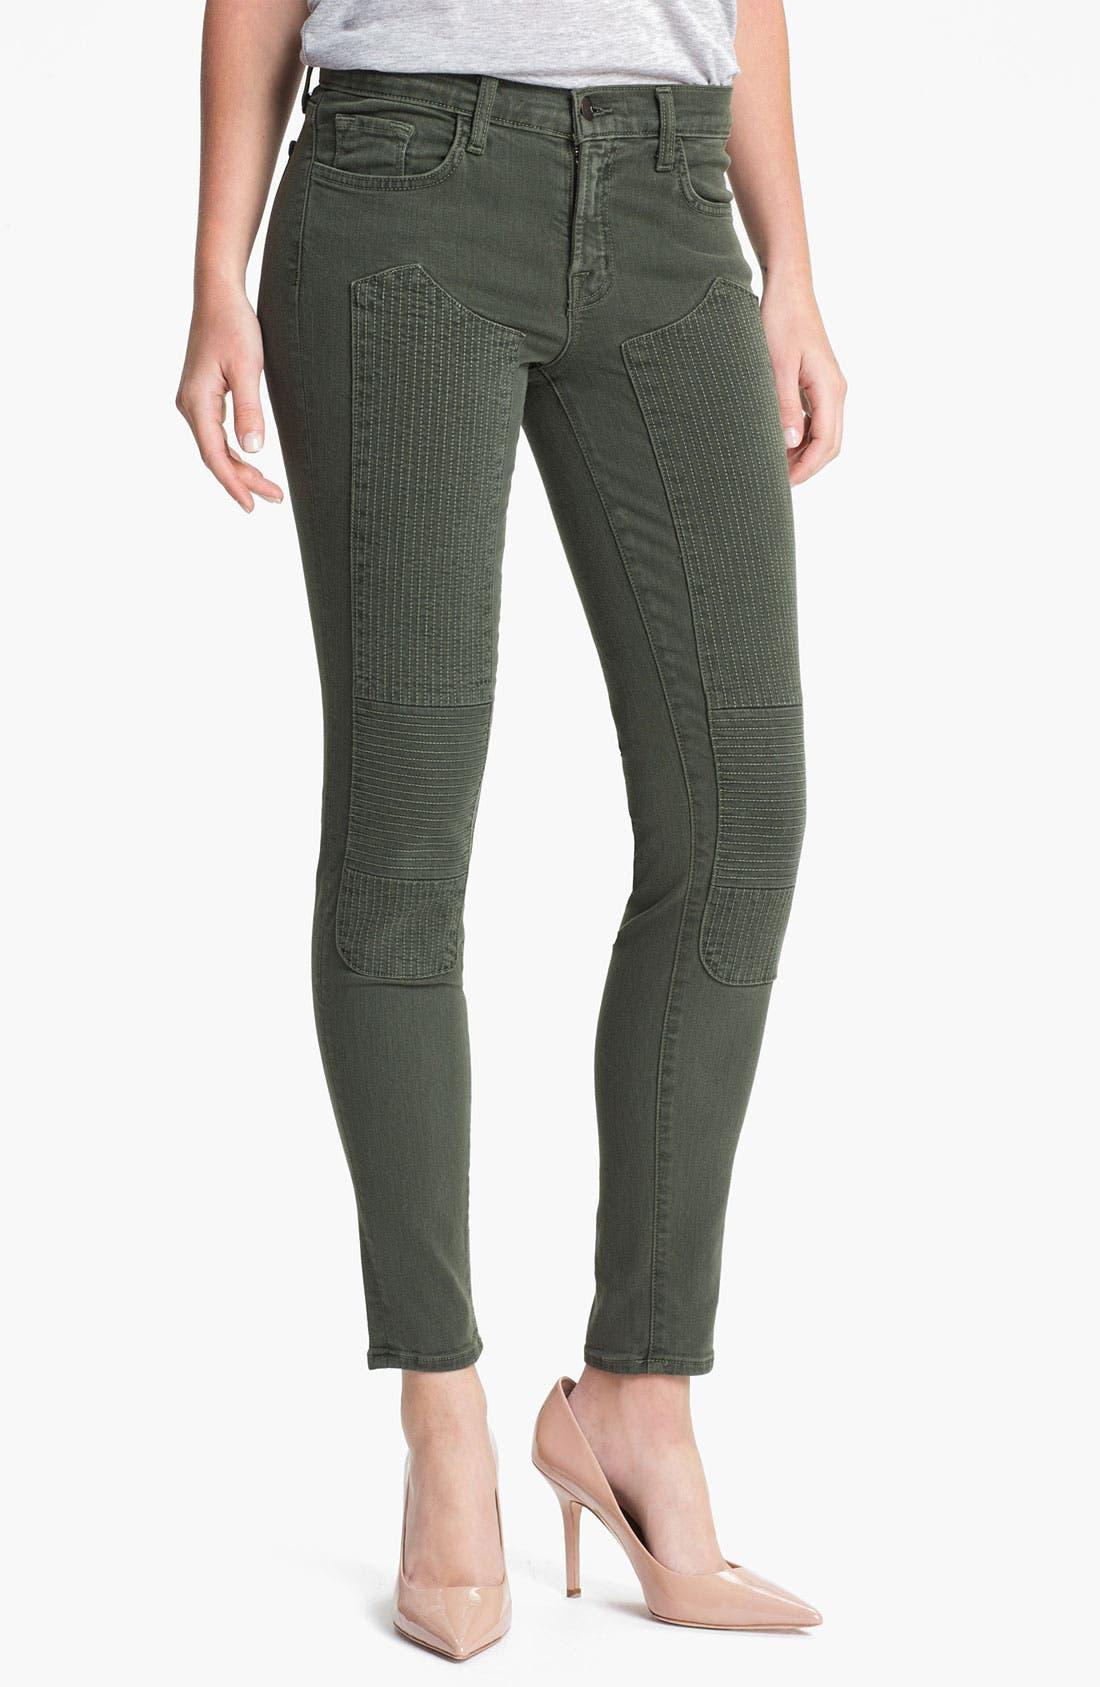 Alternate Image 1 Selected - J Brand Quilted Panel Skinny Moto Jeans (Vin Mantis)